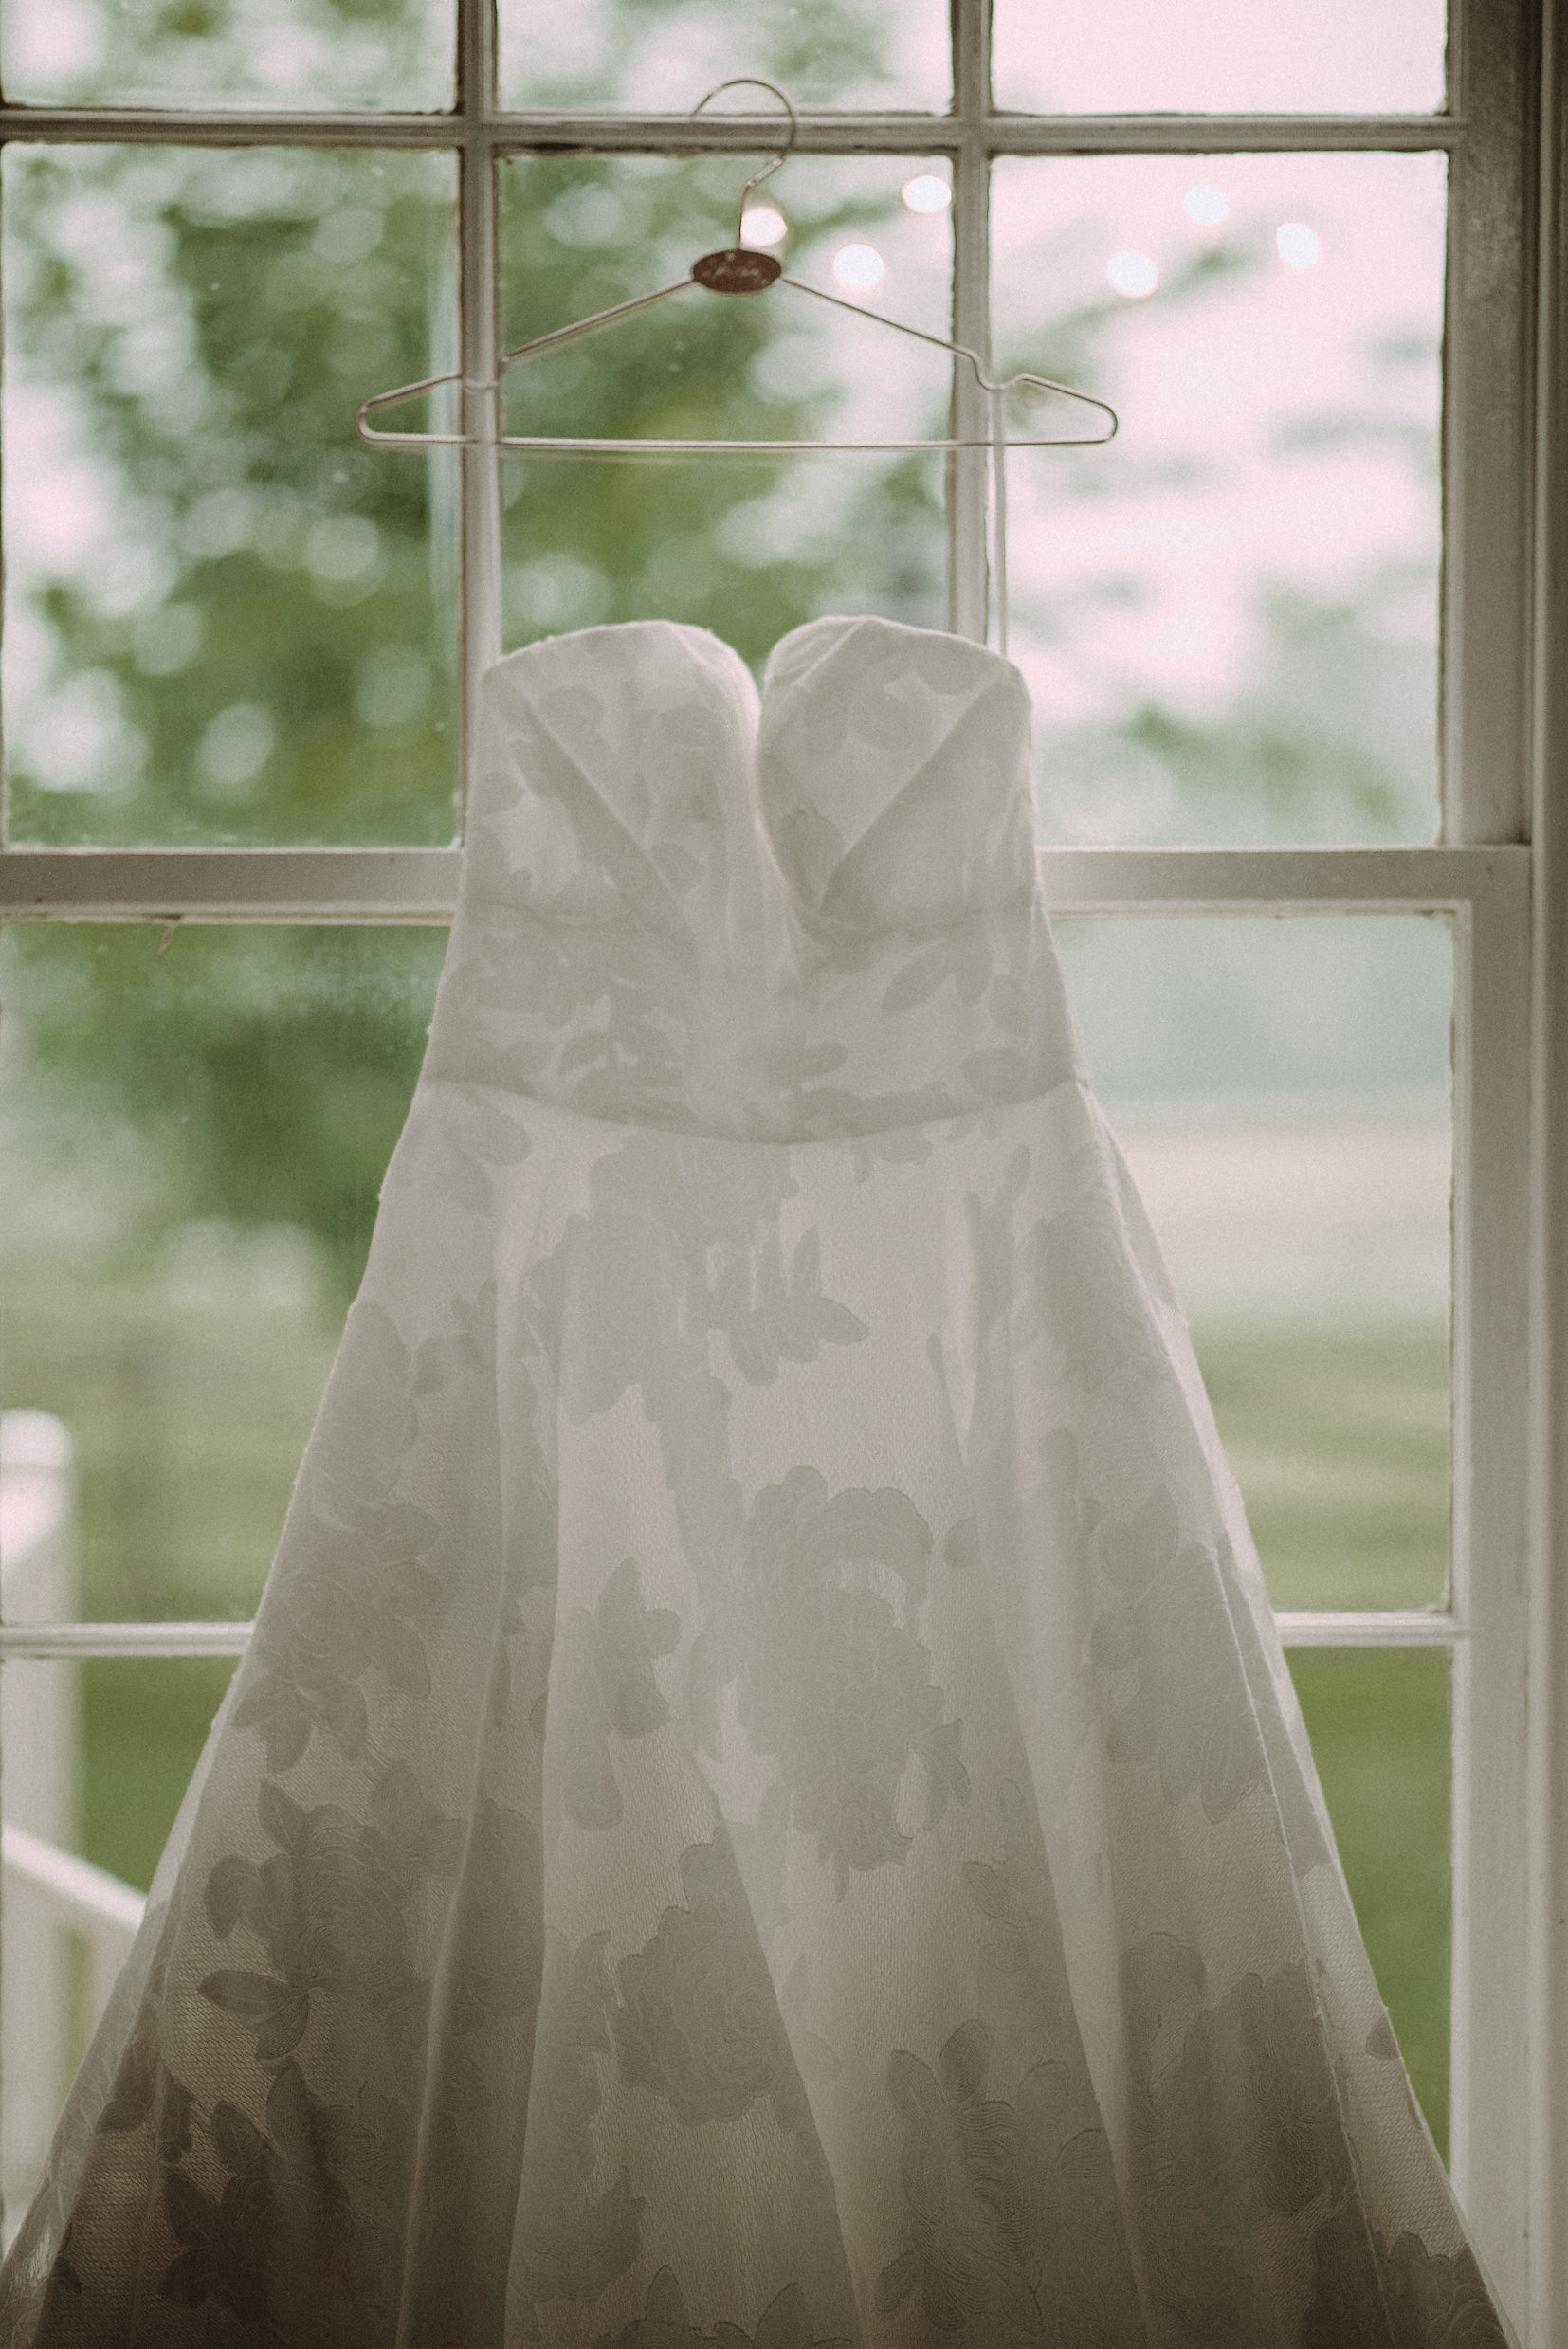 Wedding dress hanging in window